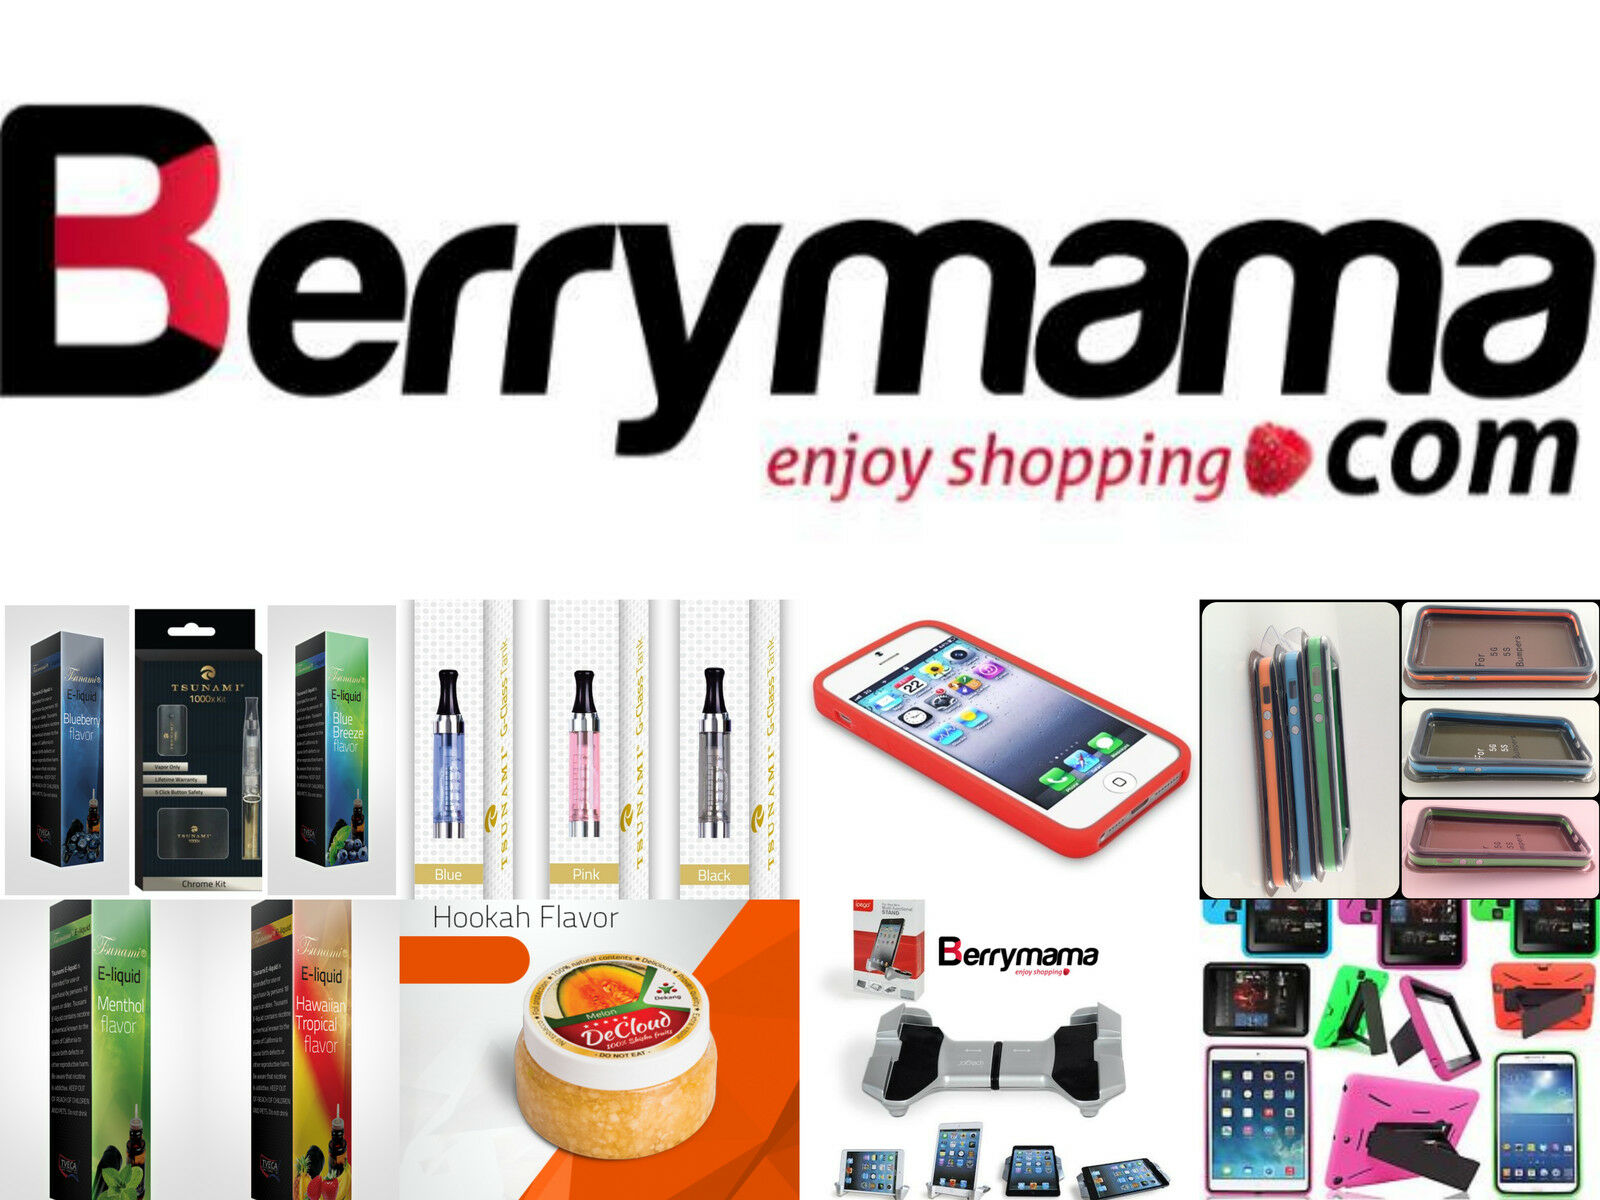 Berrymama Shop